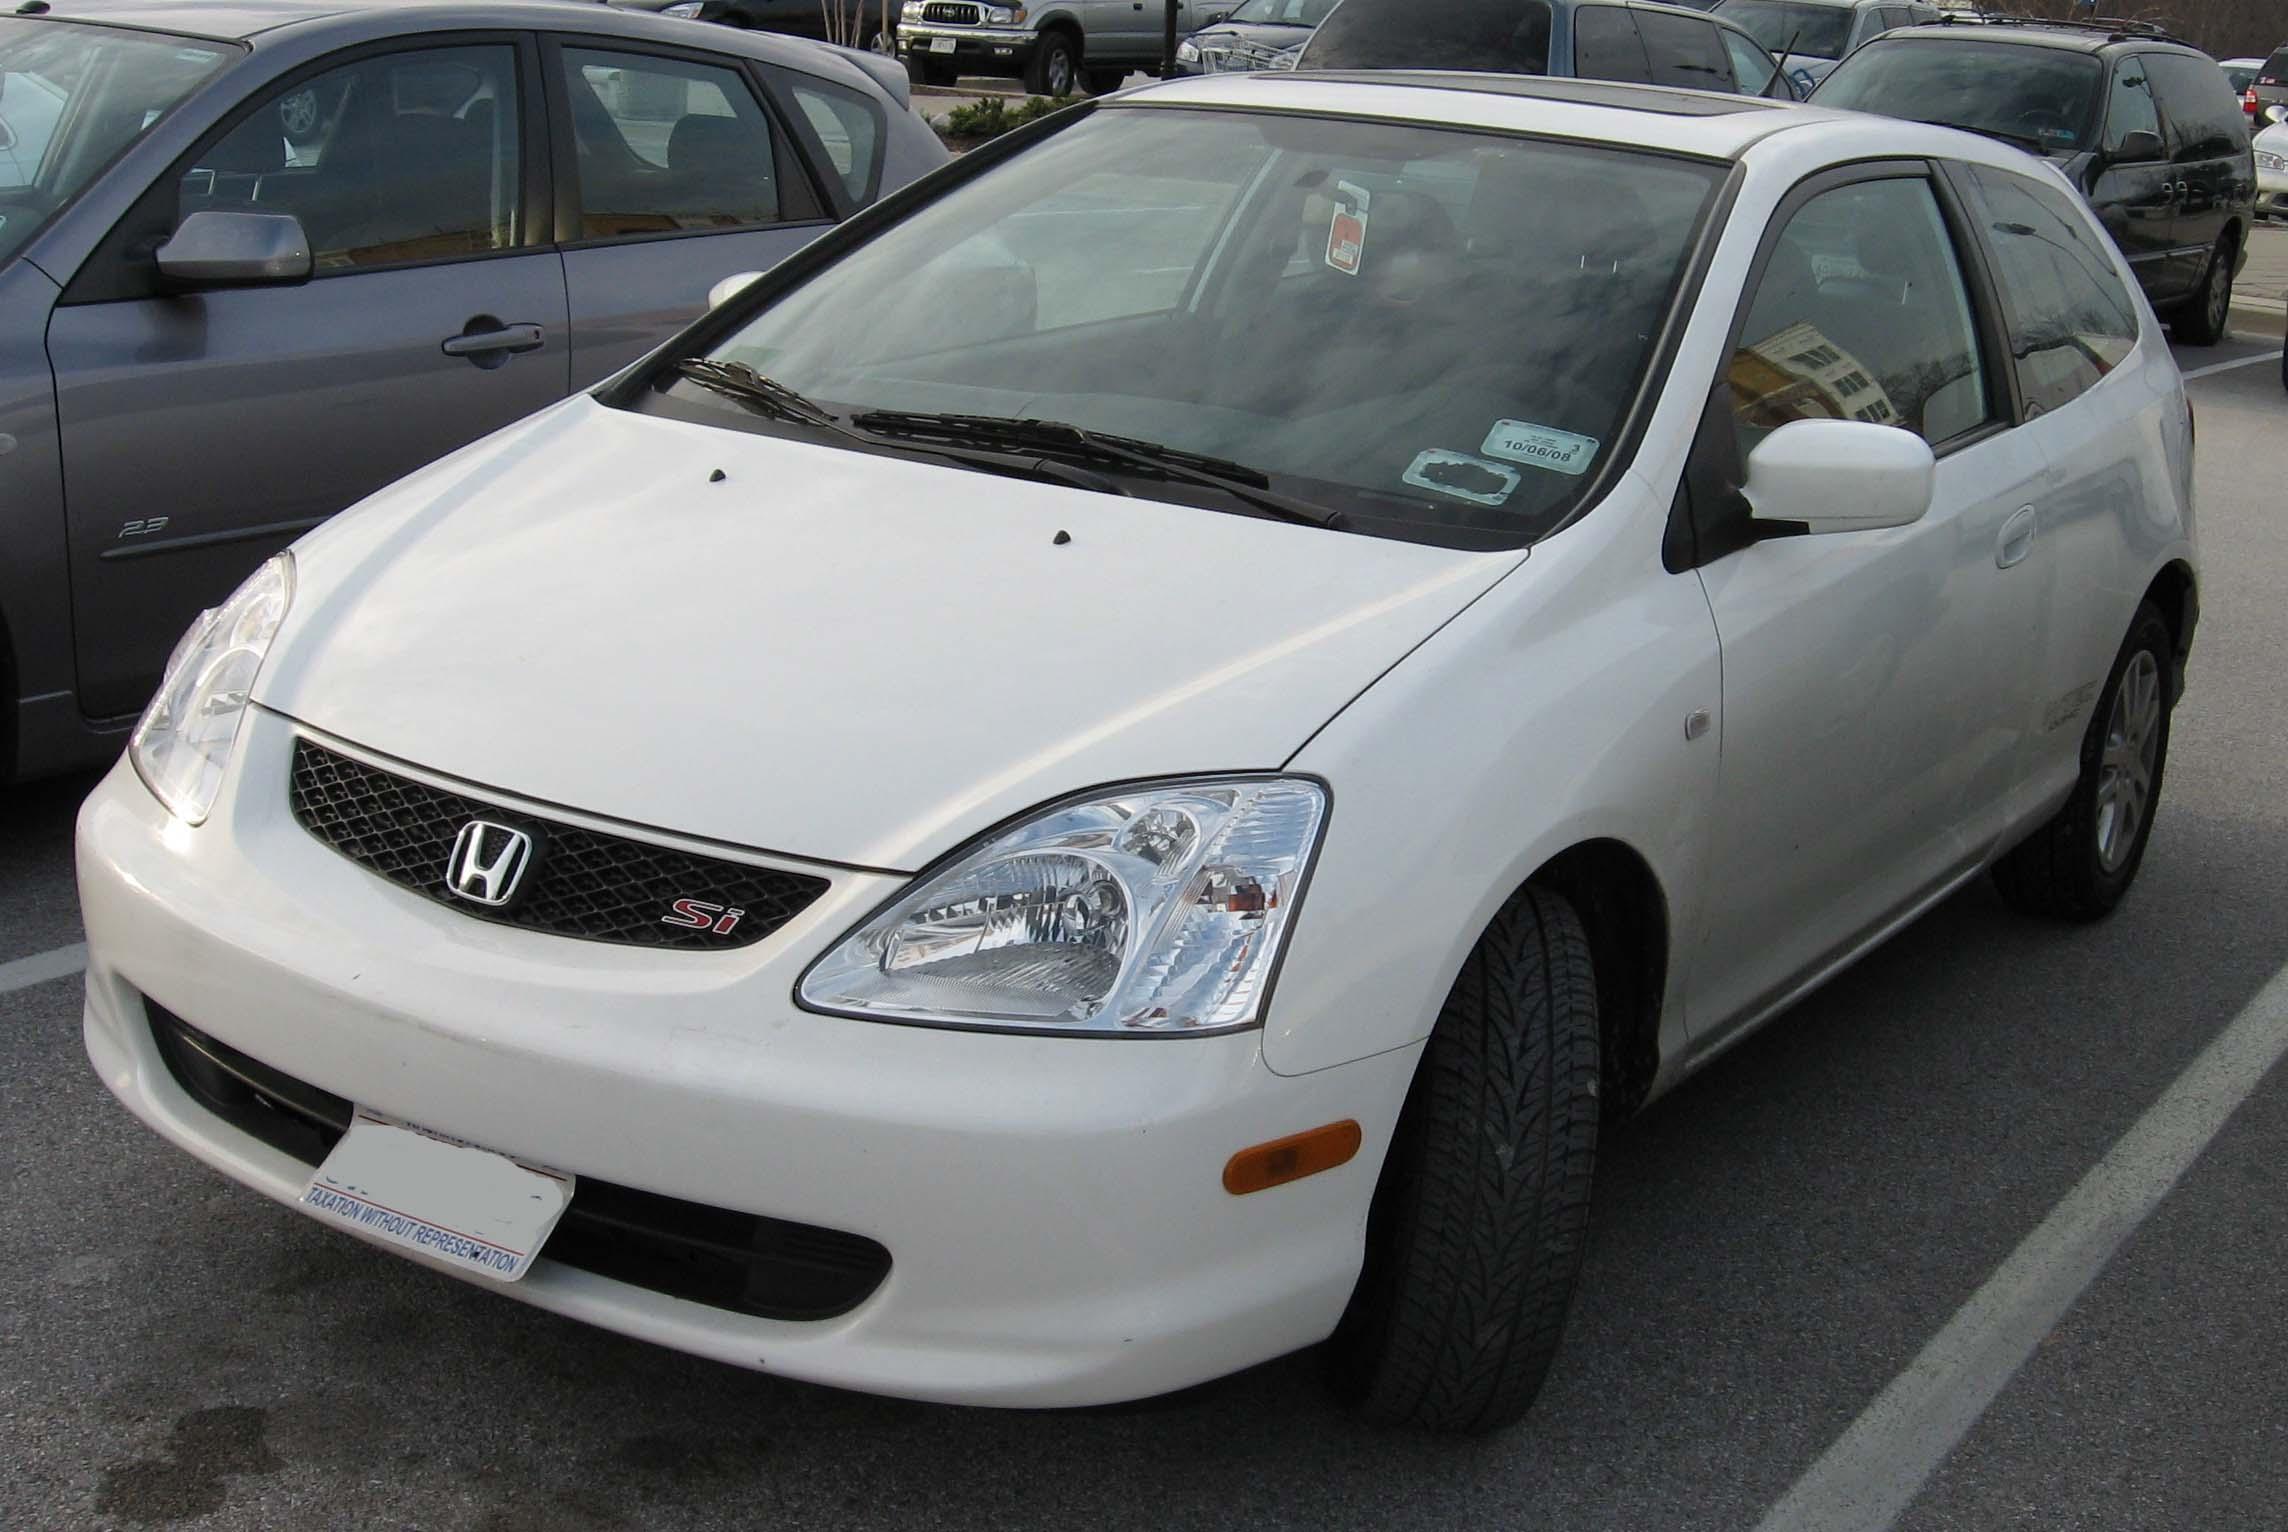 File:02 04 Honda Civic Si